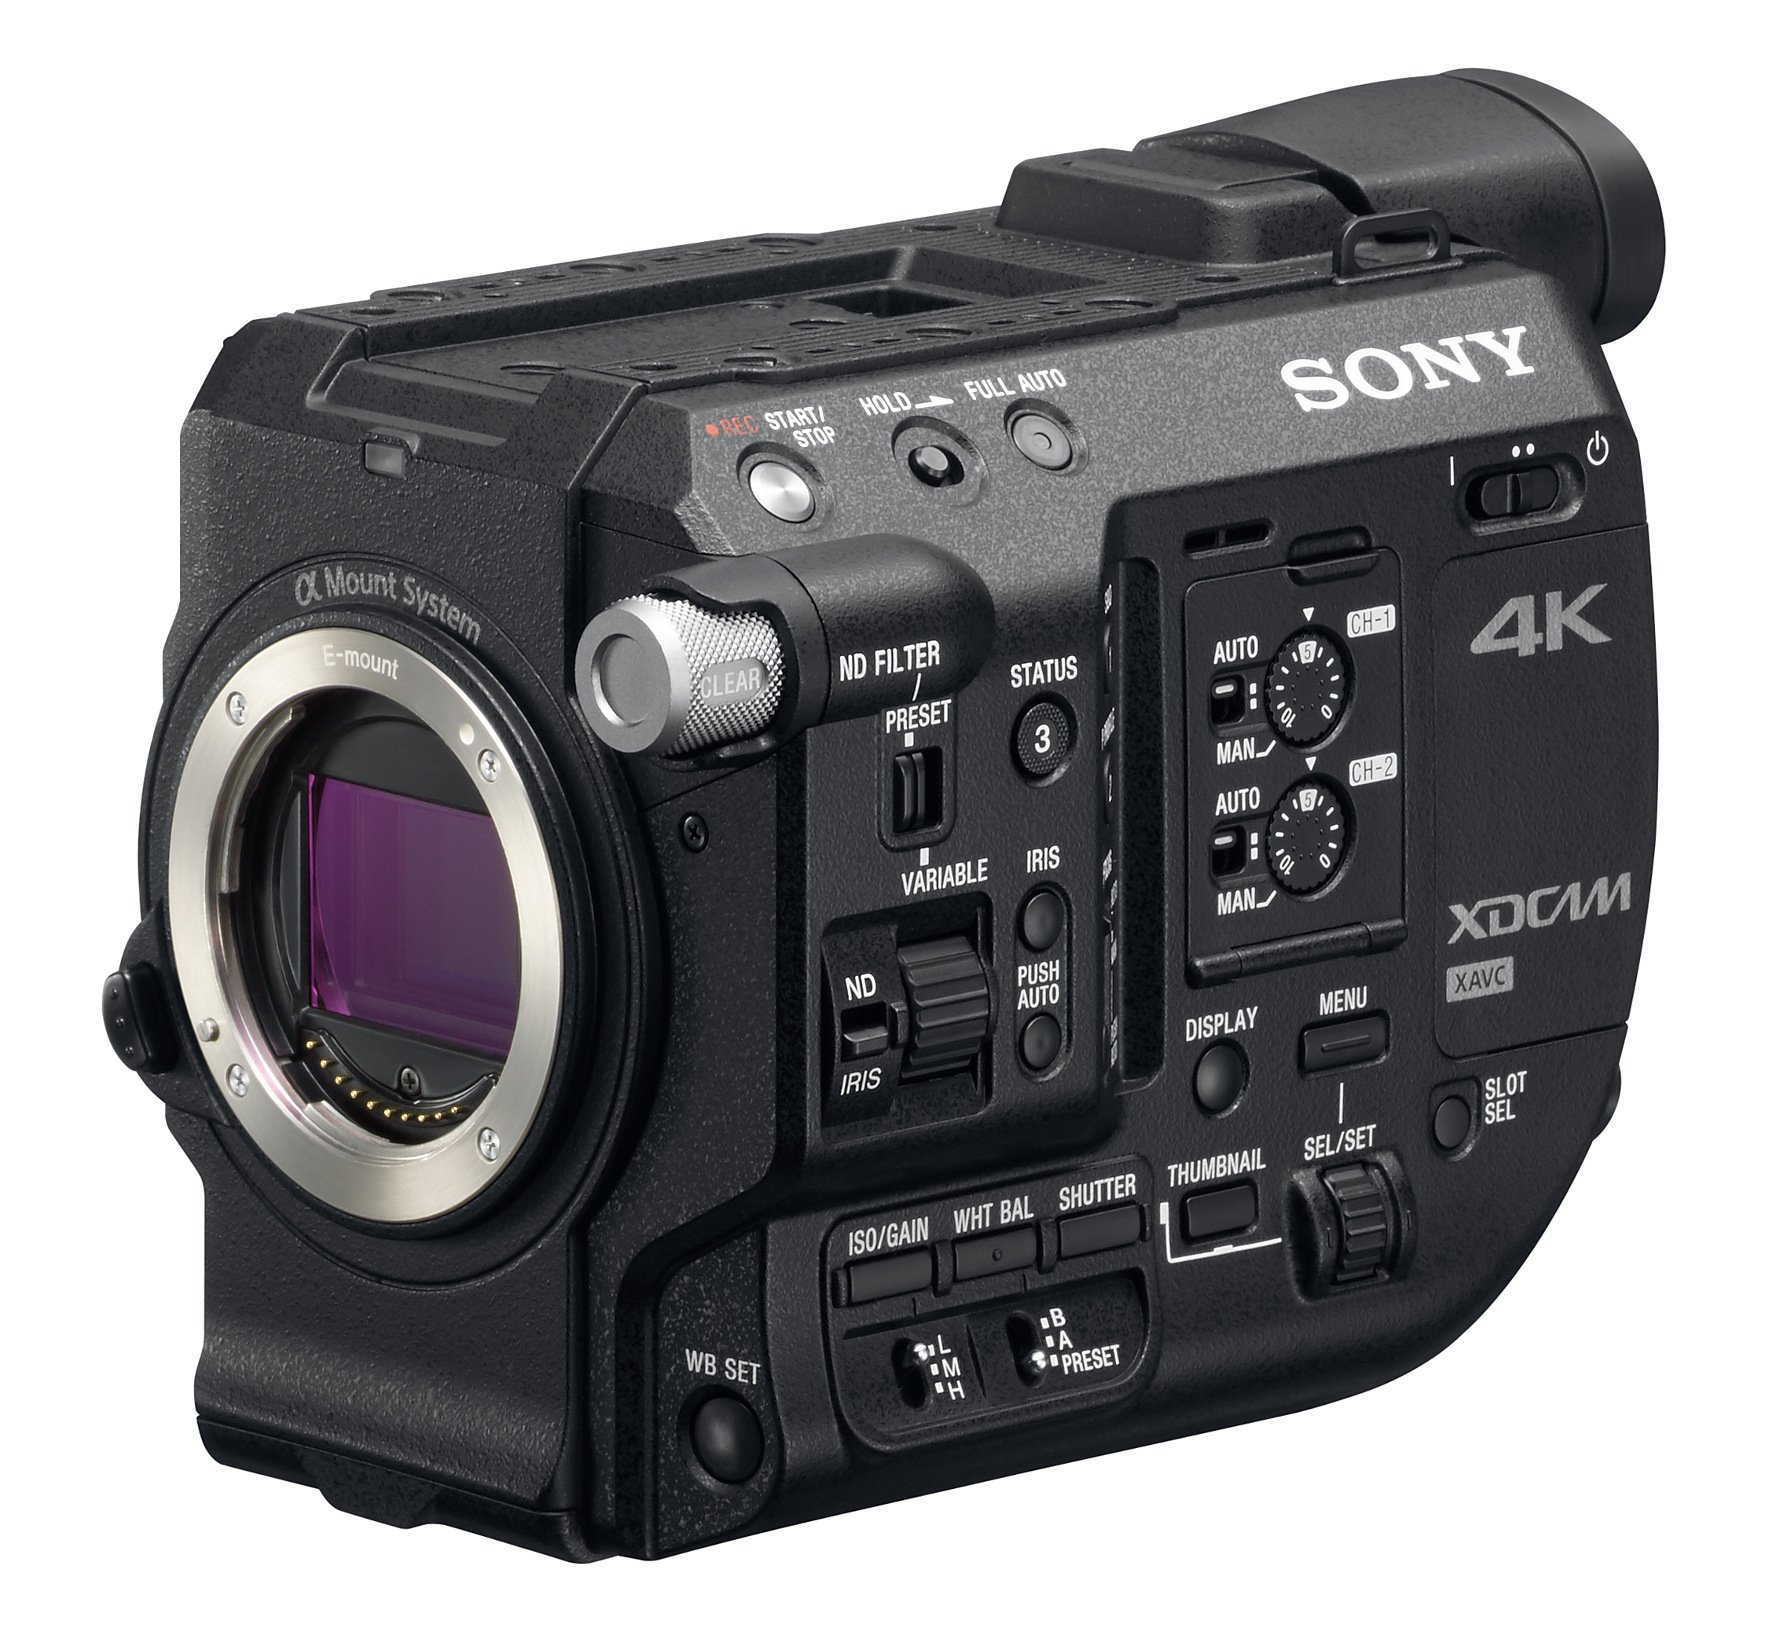 Sony PXW FS5 4K XDCAM Camcorder Body Instant Rebate